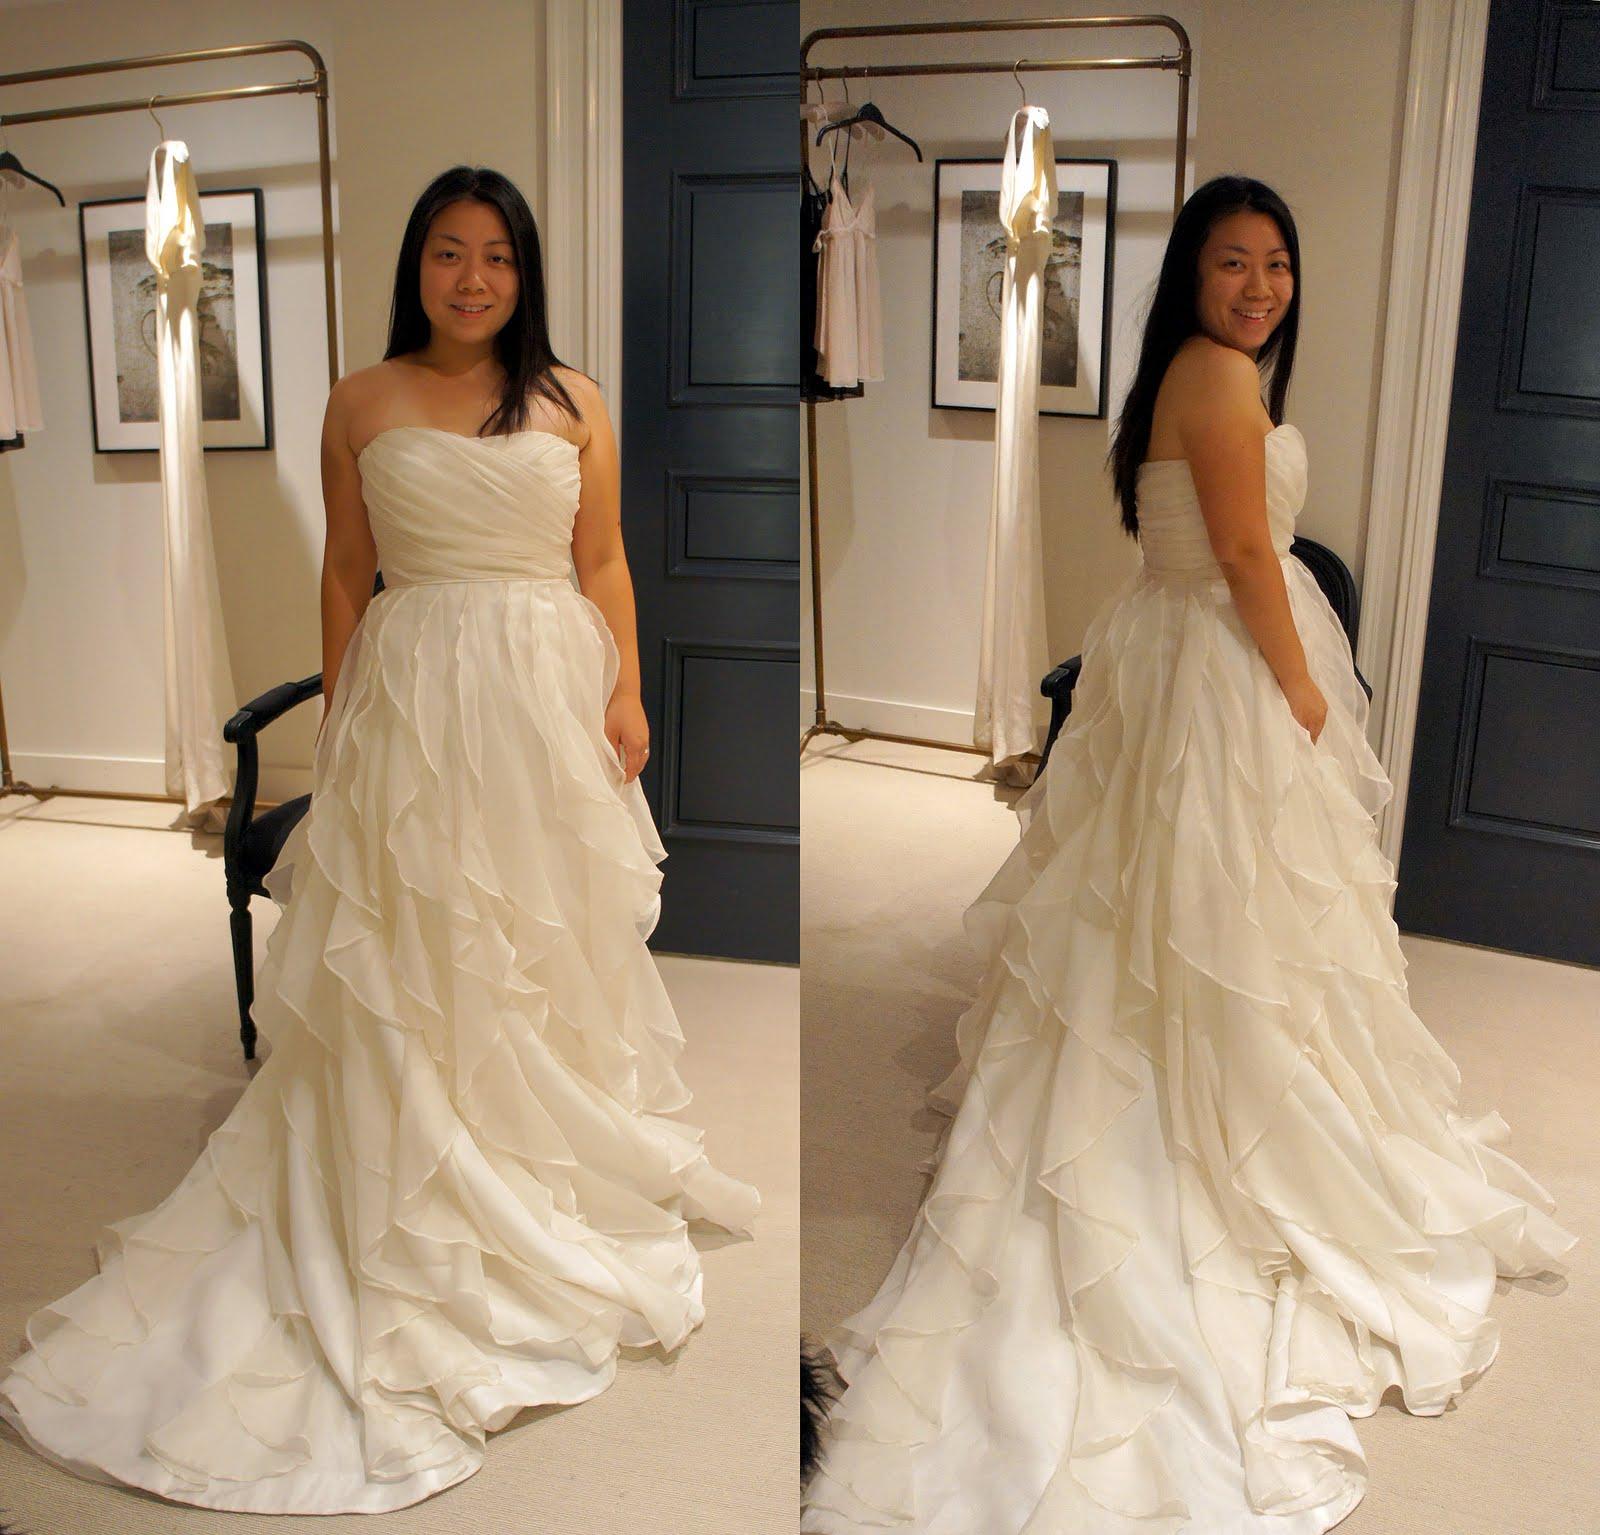 worst wedding dresses - HD1600×1535